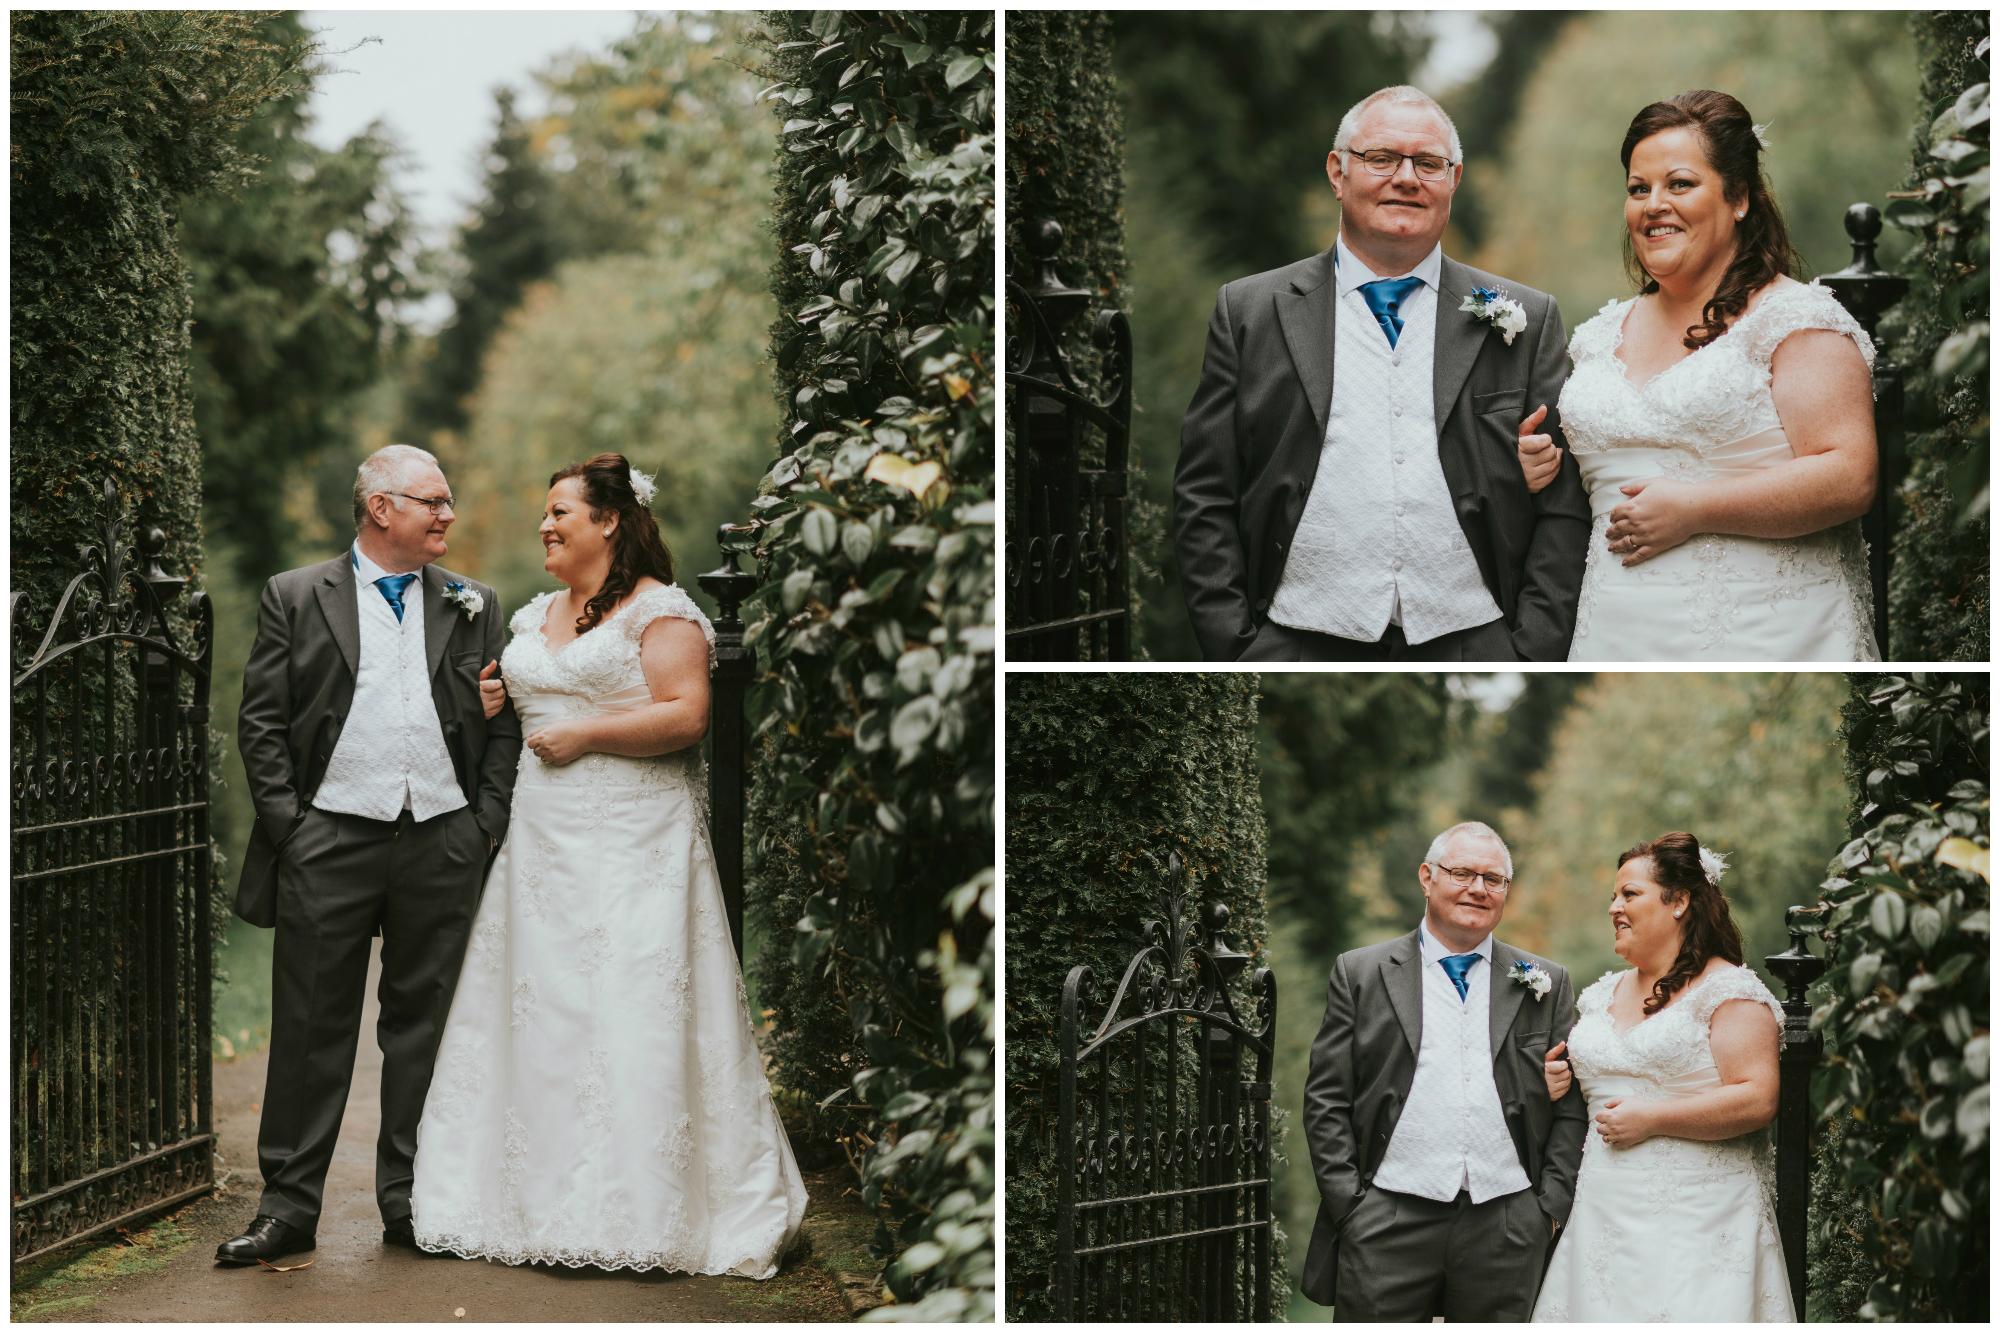 Lady dixon park belfast wedding photographer pure photo n.i portrait bride and groom